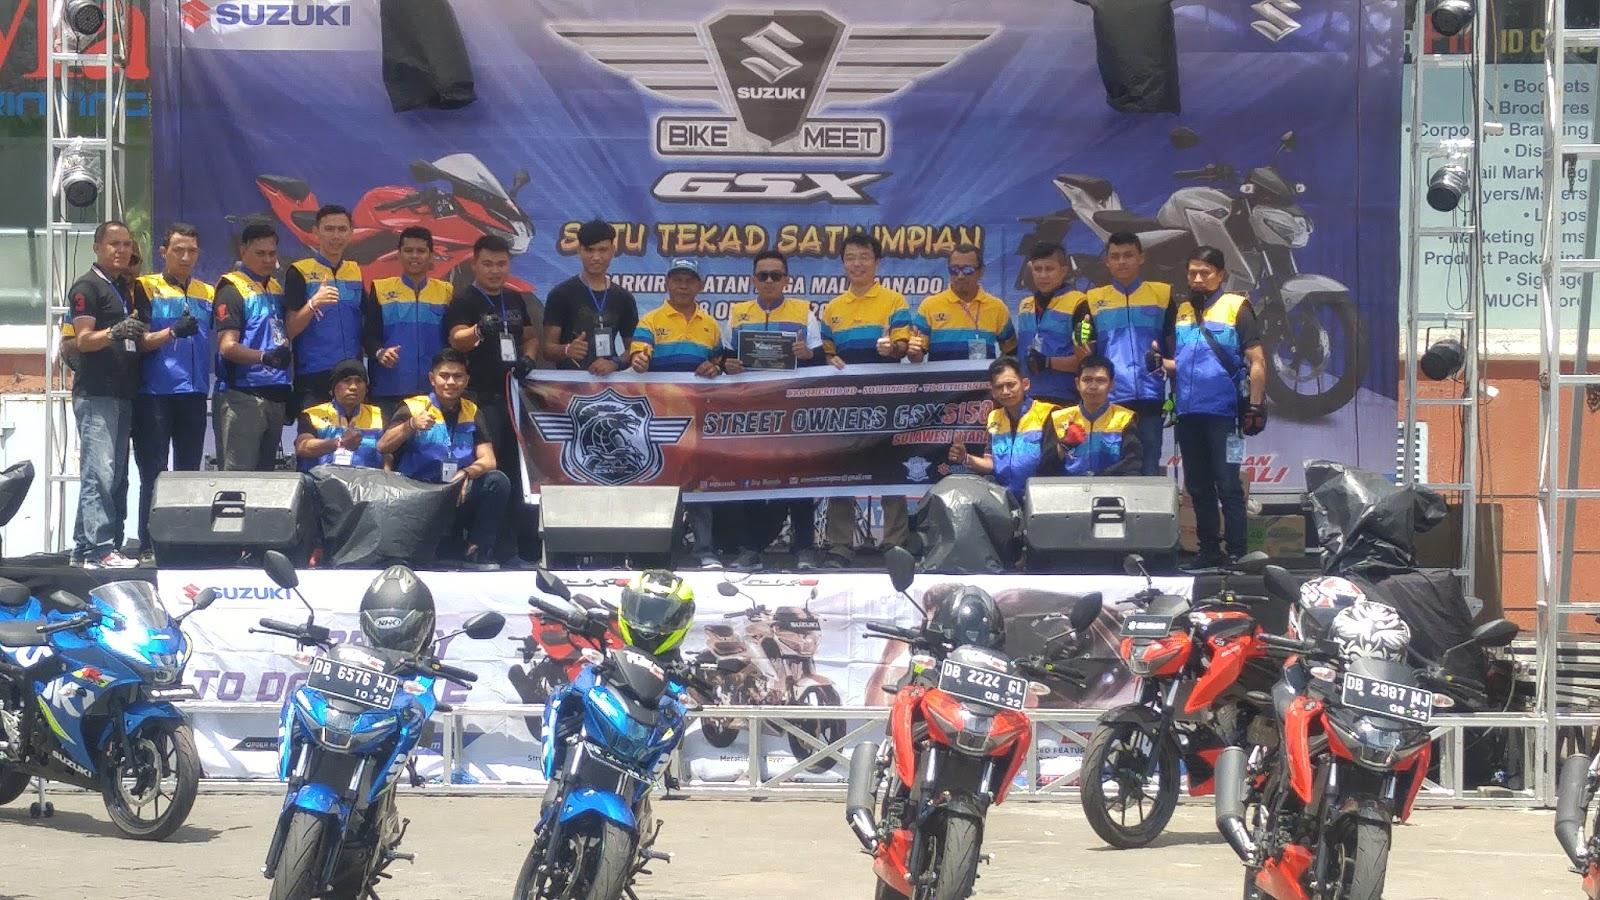 Di Hari Sumpah Pemuda, Rangkaian Suzuki Bike Meet 'Satu Tekad, Satu Impian' Dimulai di Manado